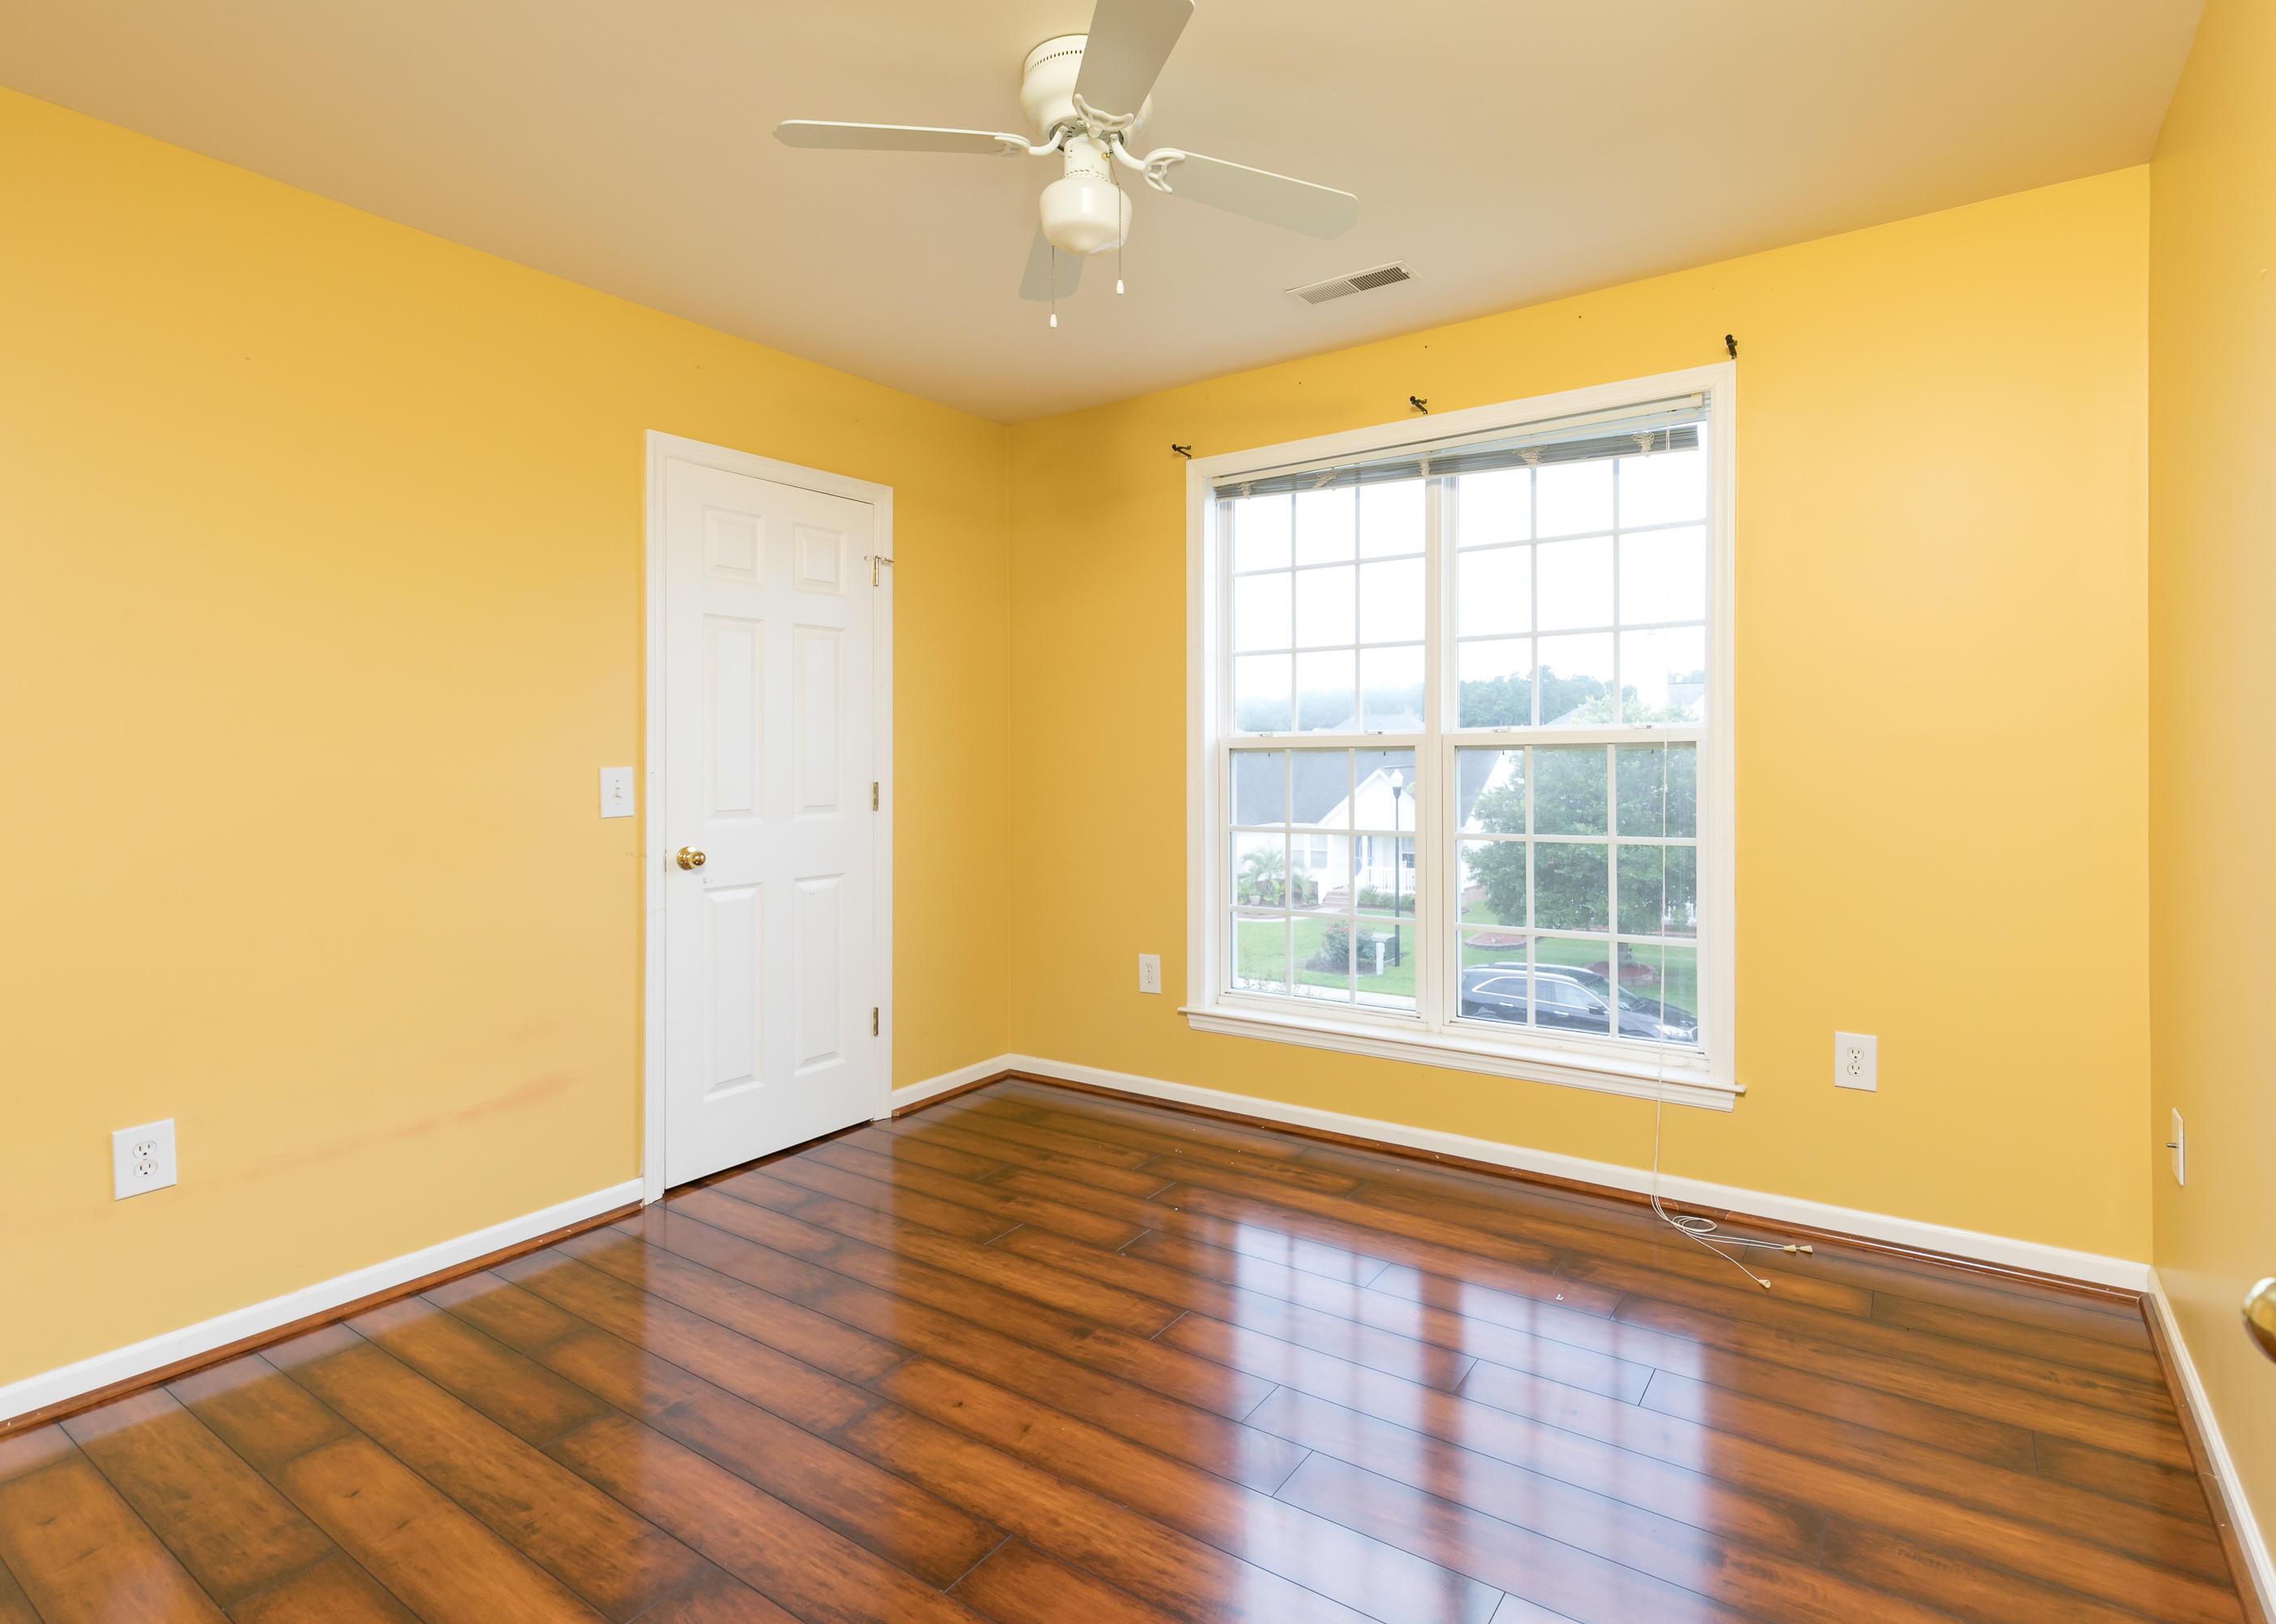 Southern Magnolias Homes For Sale - 138 Antebellum, Summerville, SC - 12